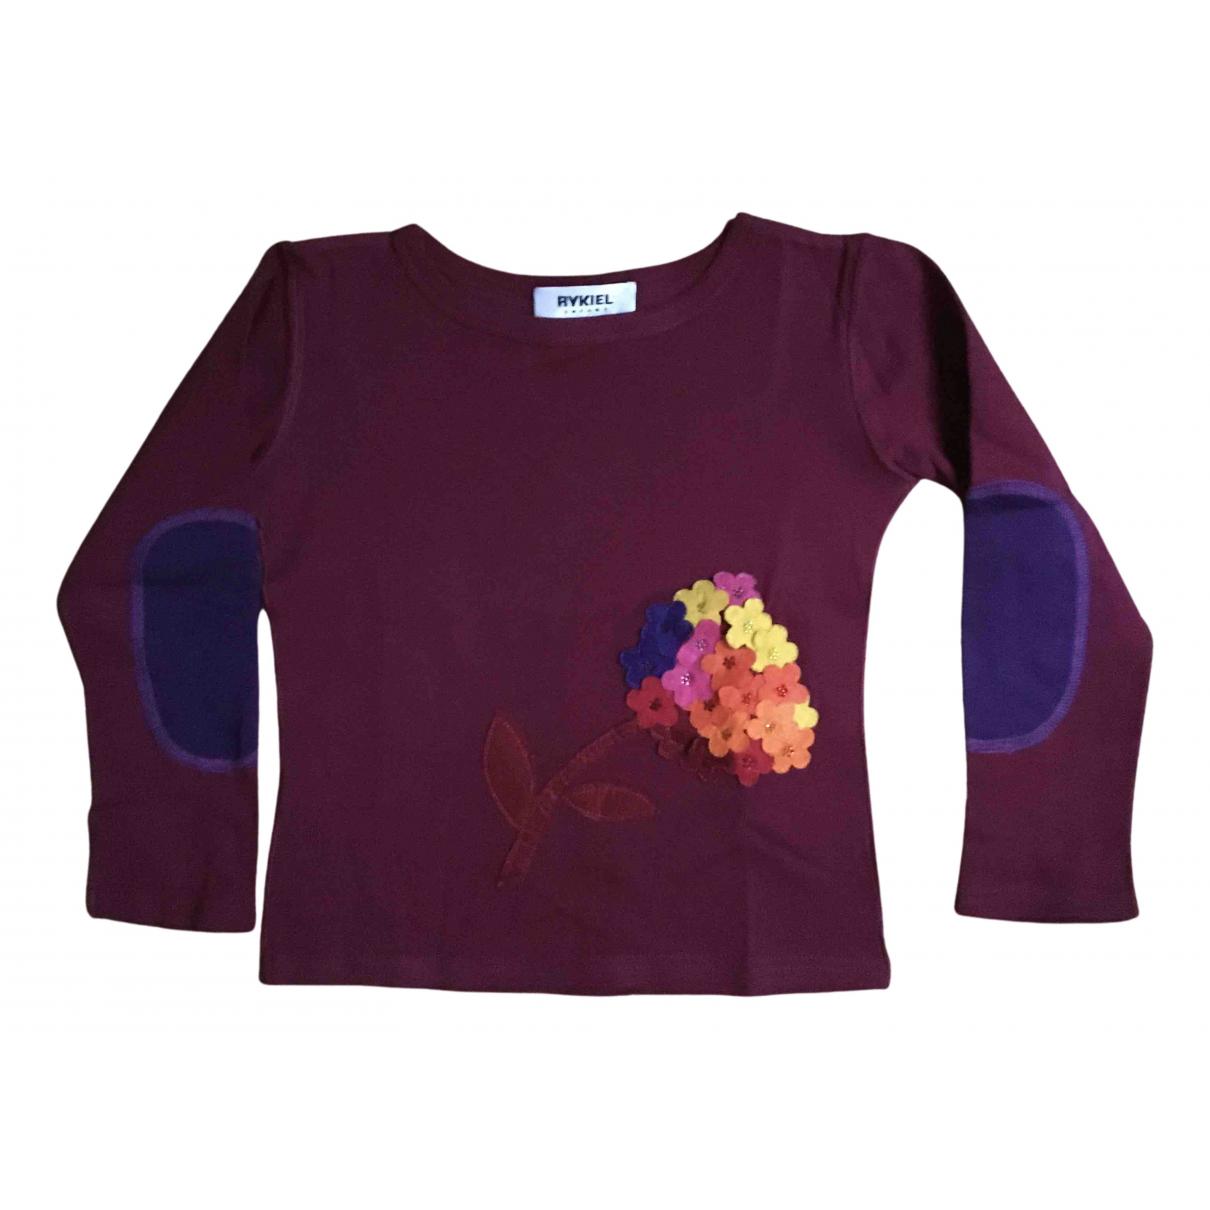 Sonia Rykiel N Burgundy Cotton Knitwear for Kids 6 years - up to 114cm FR